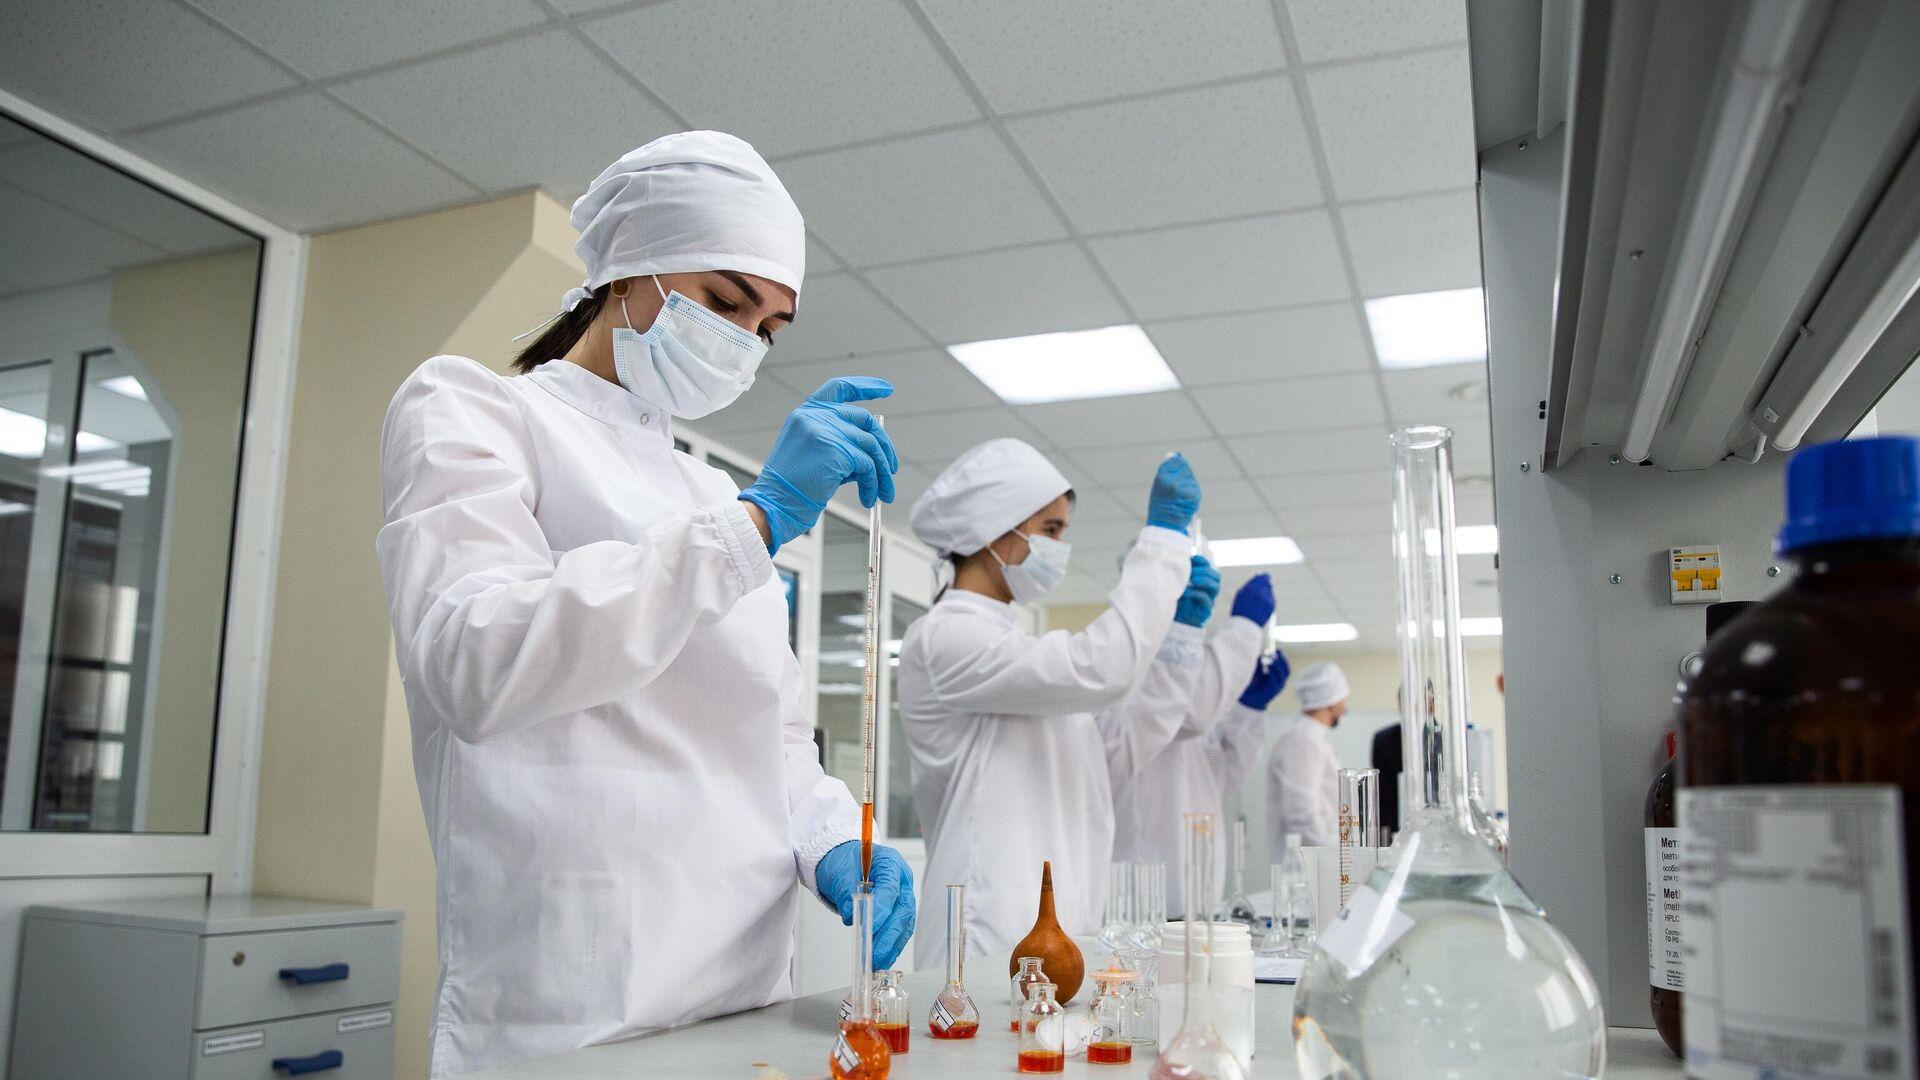 Сотрудницы в физико-химической лаборатории отдела контроля качества на предприятии Фармасинтез в Иркутске - РИА Новости, 1920, 26.07.2021